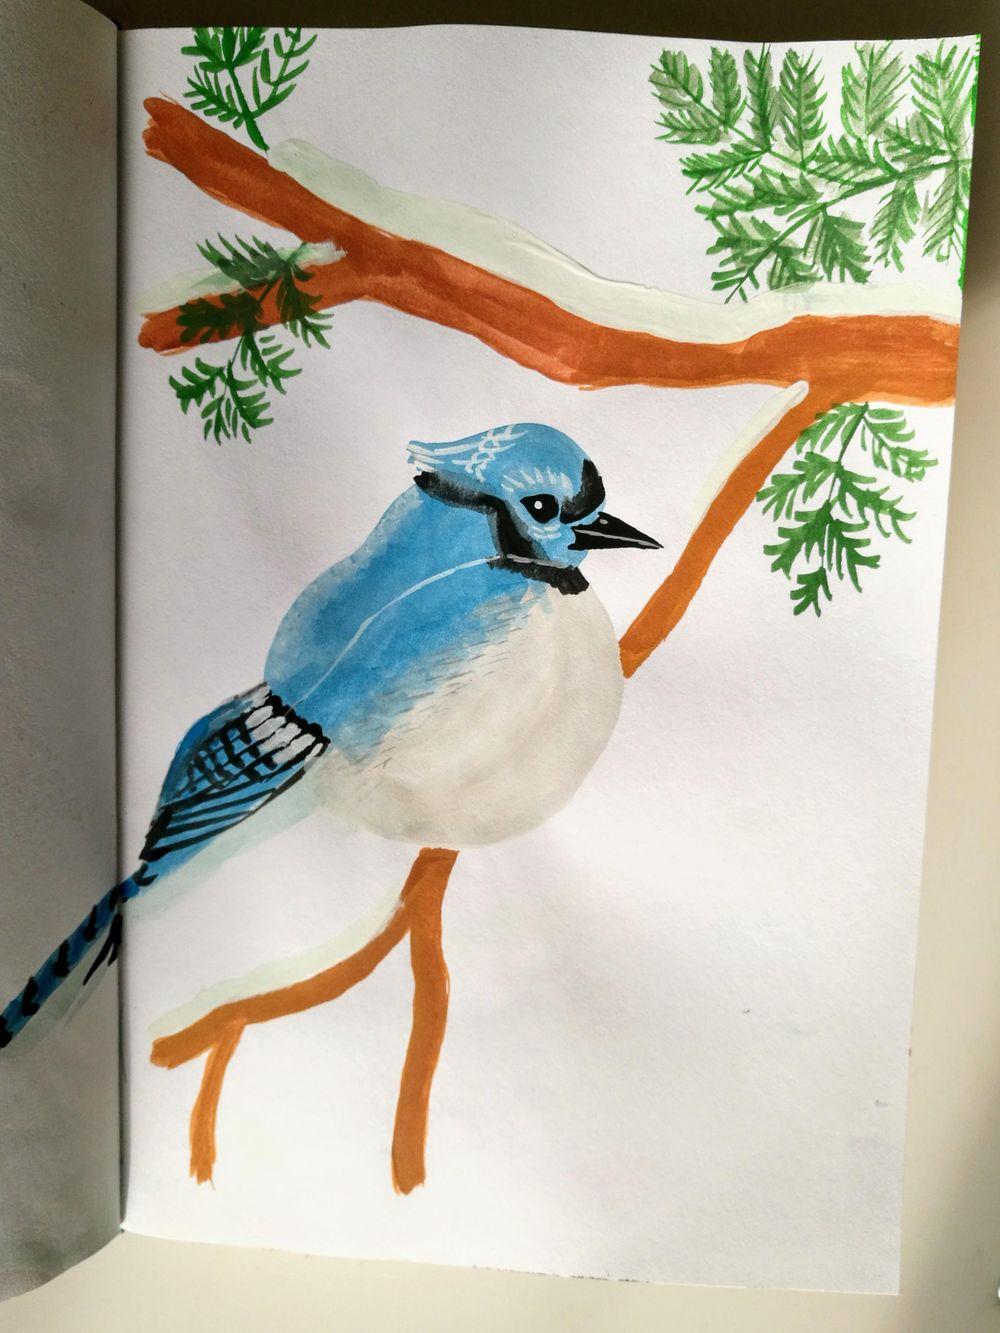 Sketchbook Magic 1 - image 17 - student project